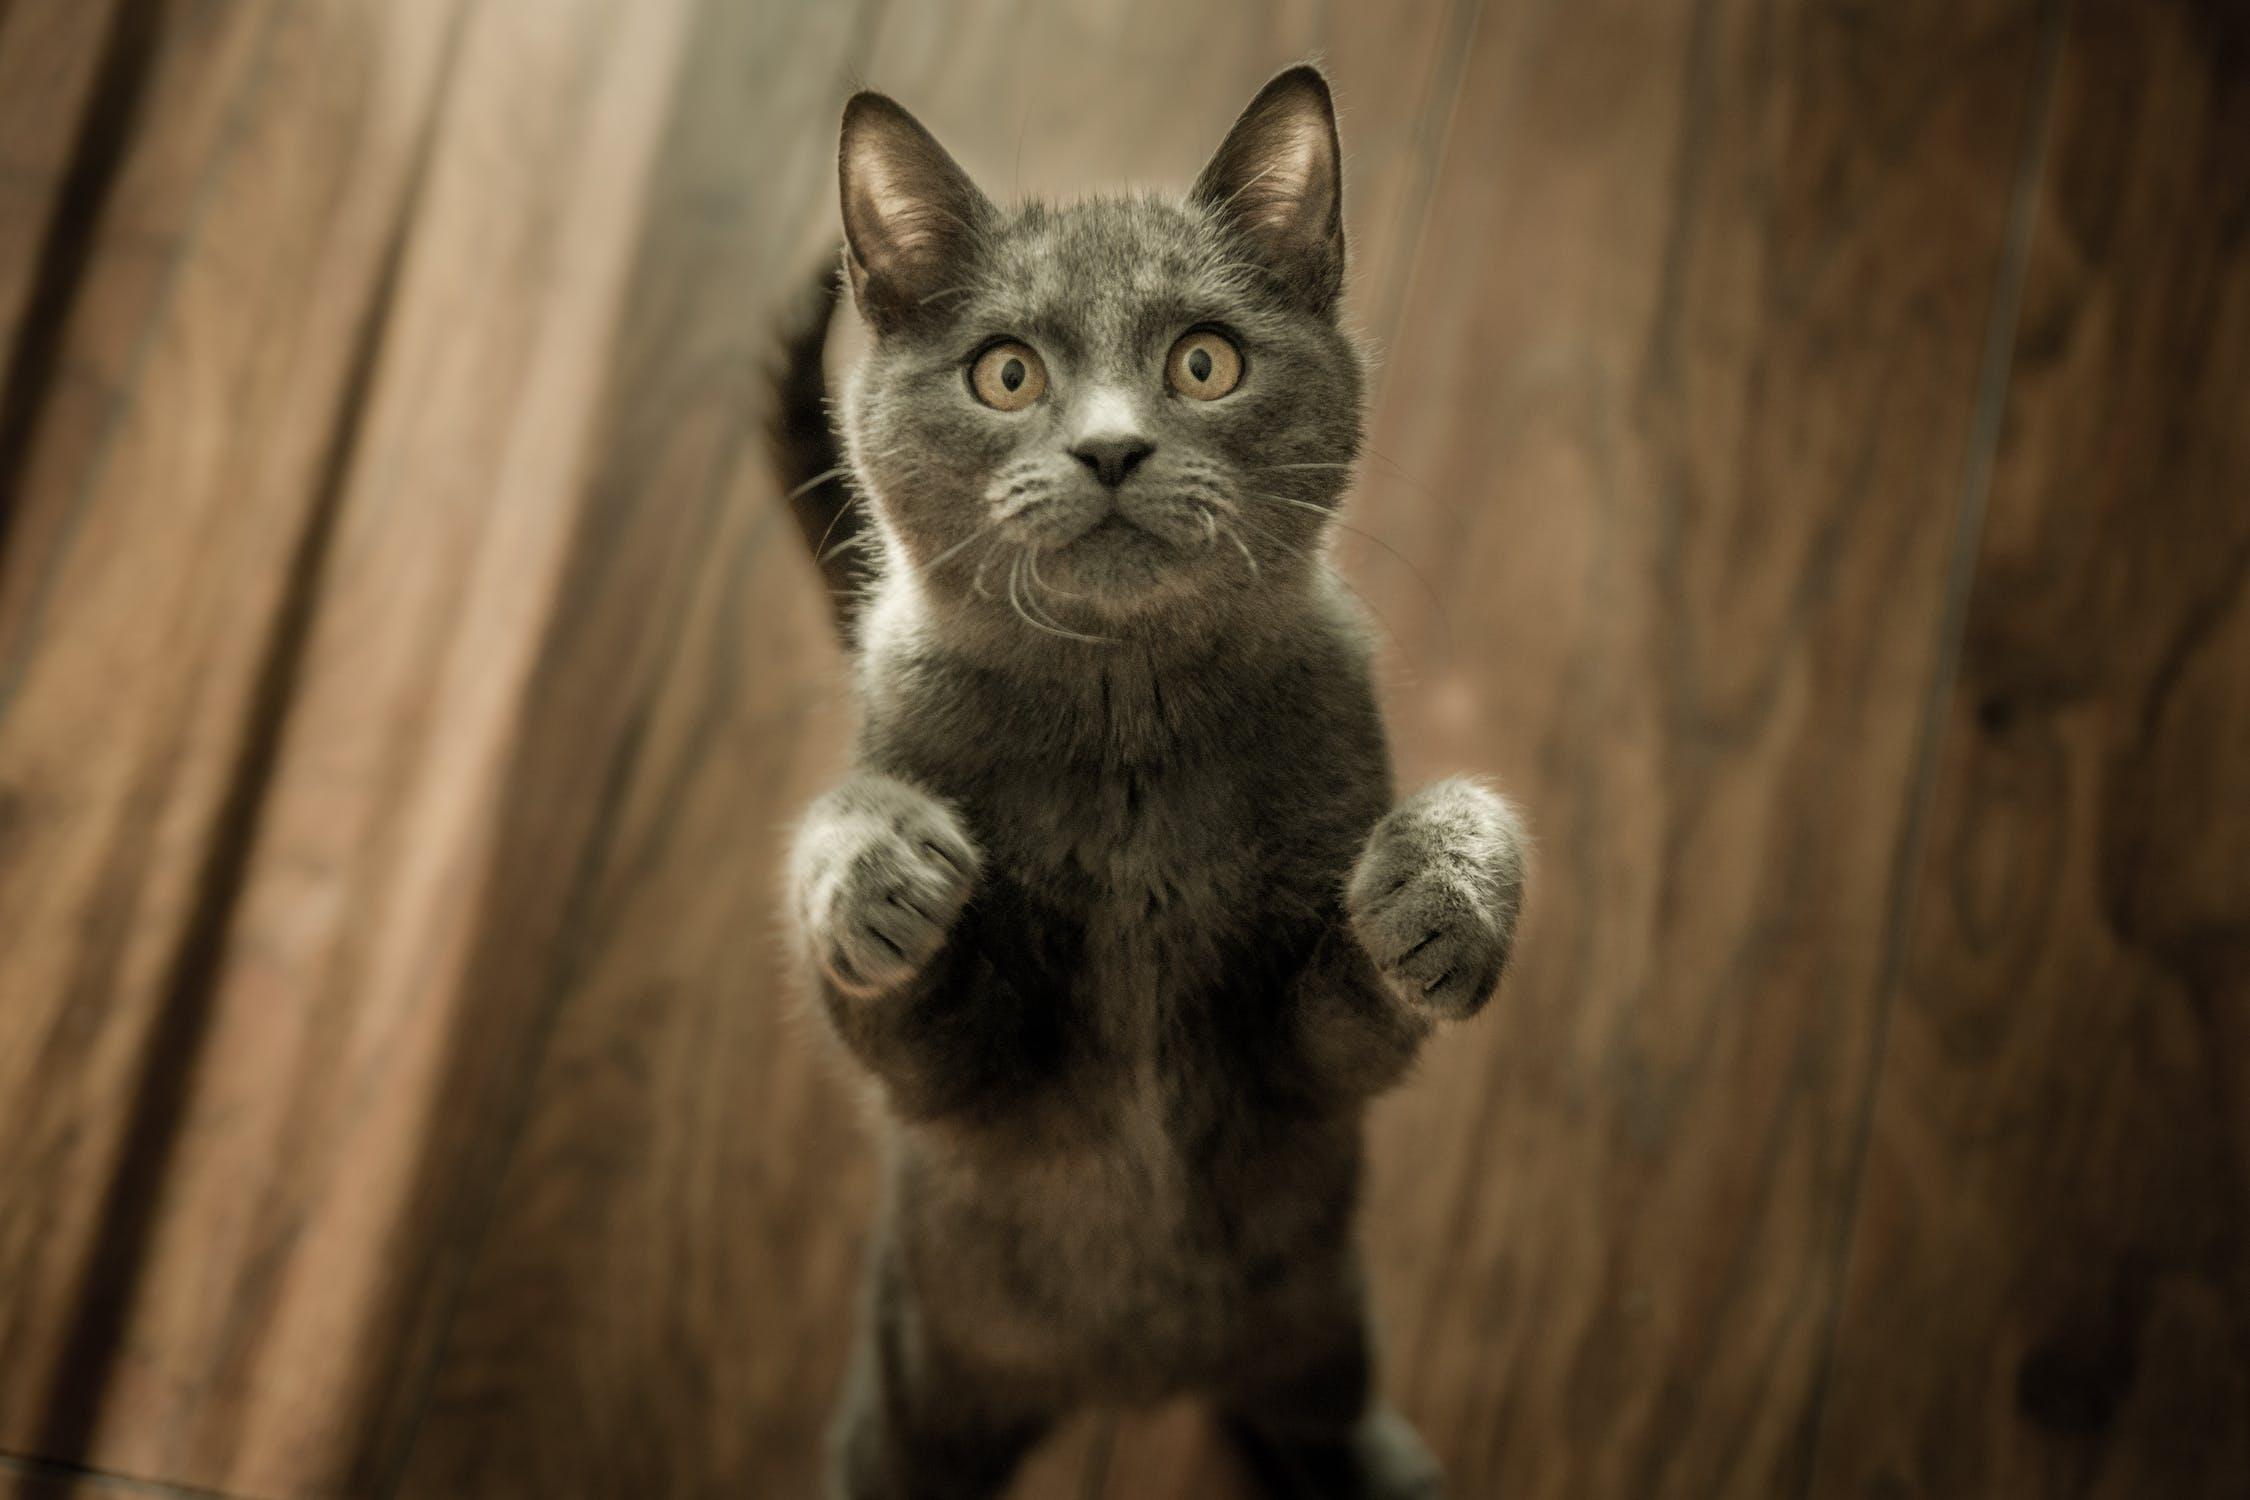 Is your cat Smart